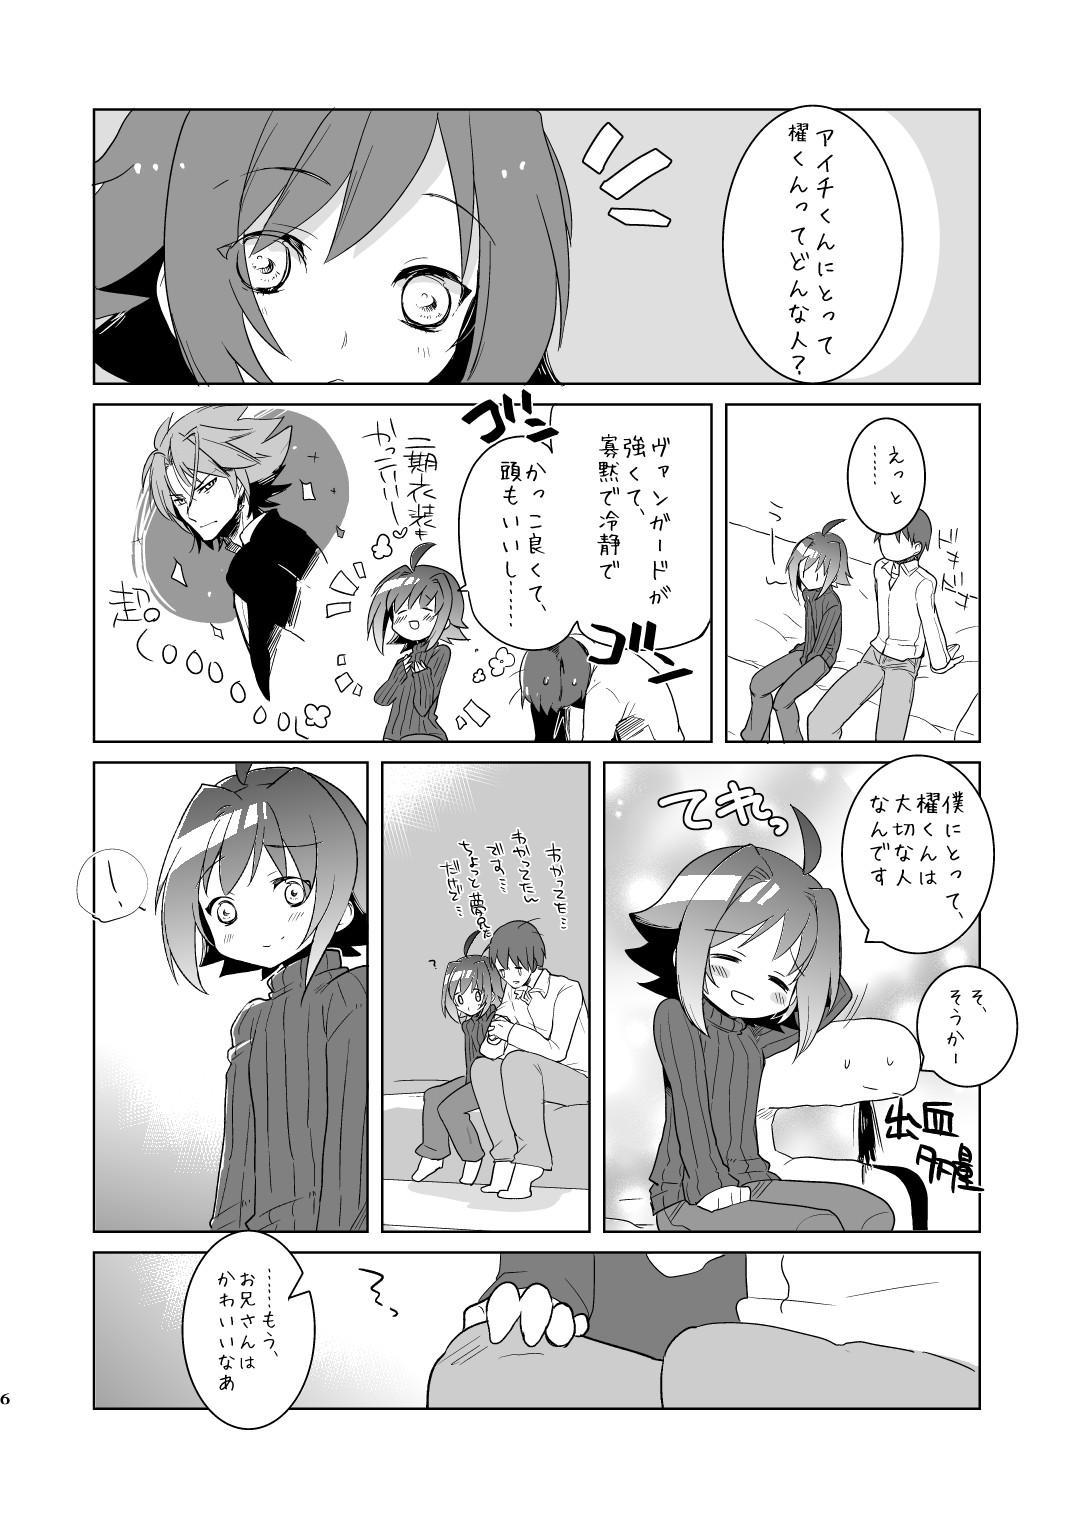 Kimi ga Koibito 5